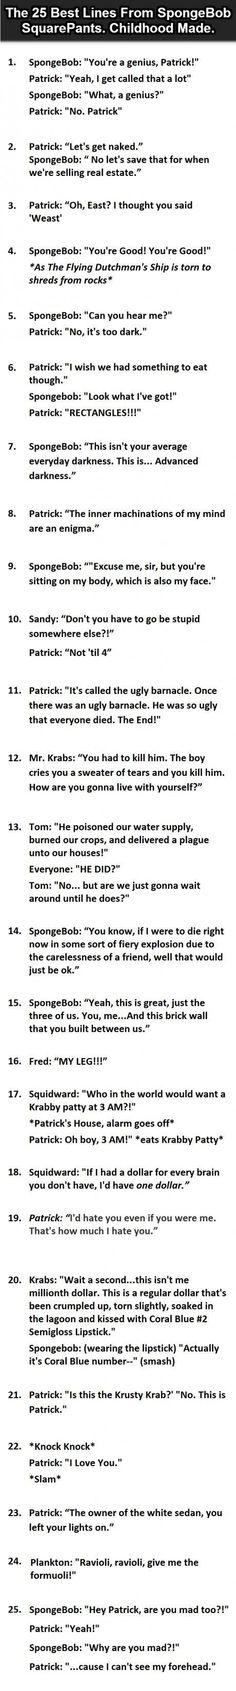 The Best Lines From Spongebob Squarepants. http://ibeebz.com